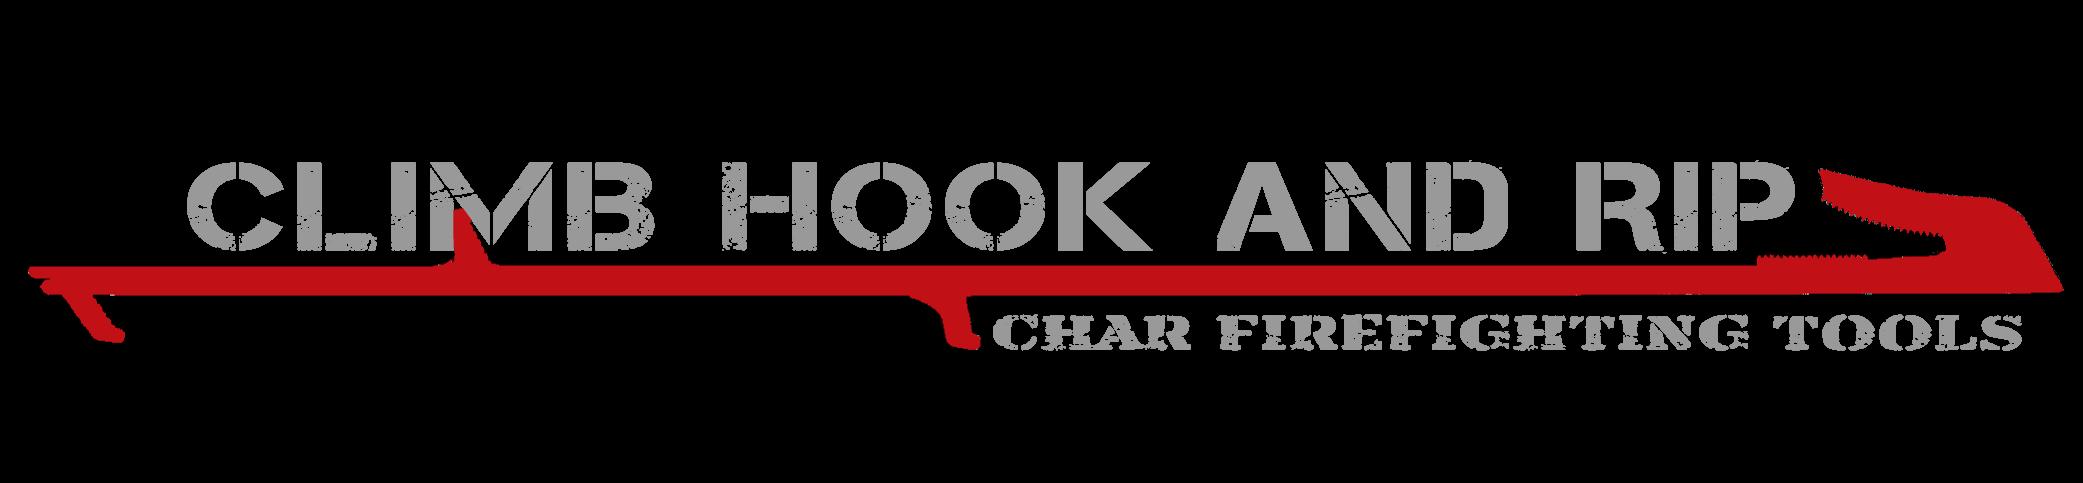 CLIMB HOOK AND RIP